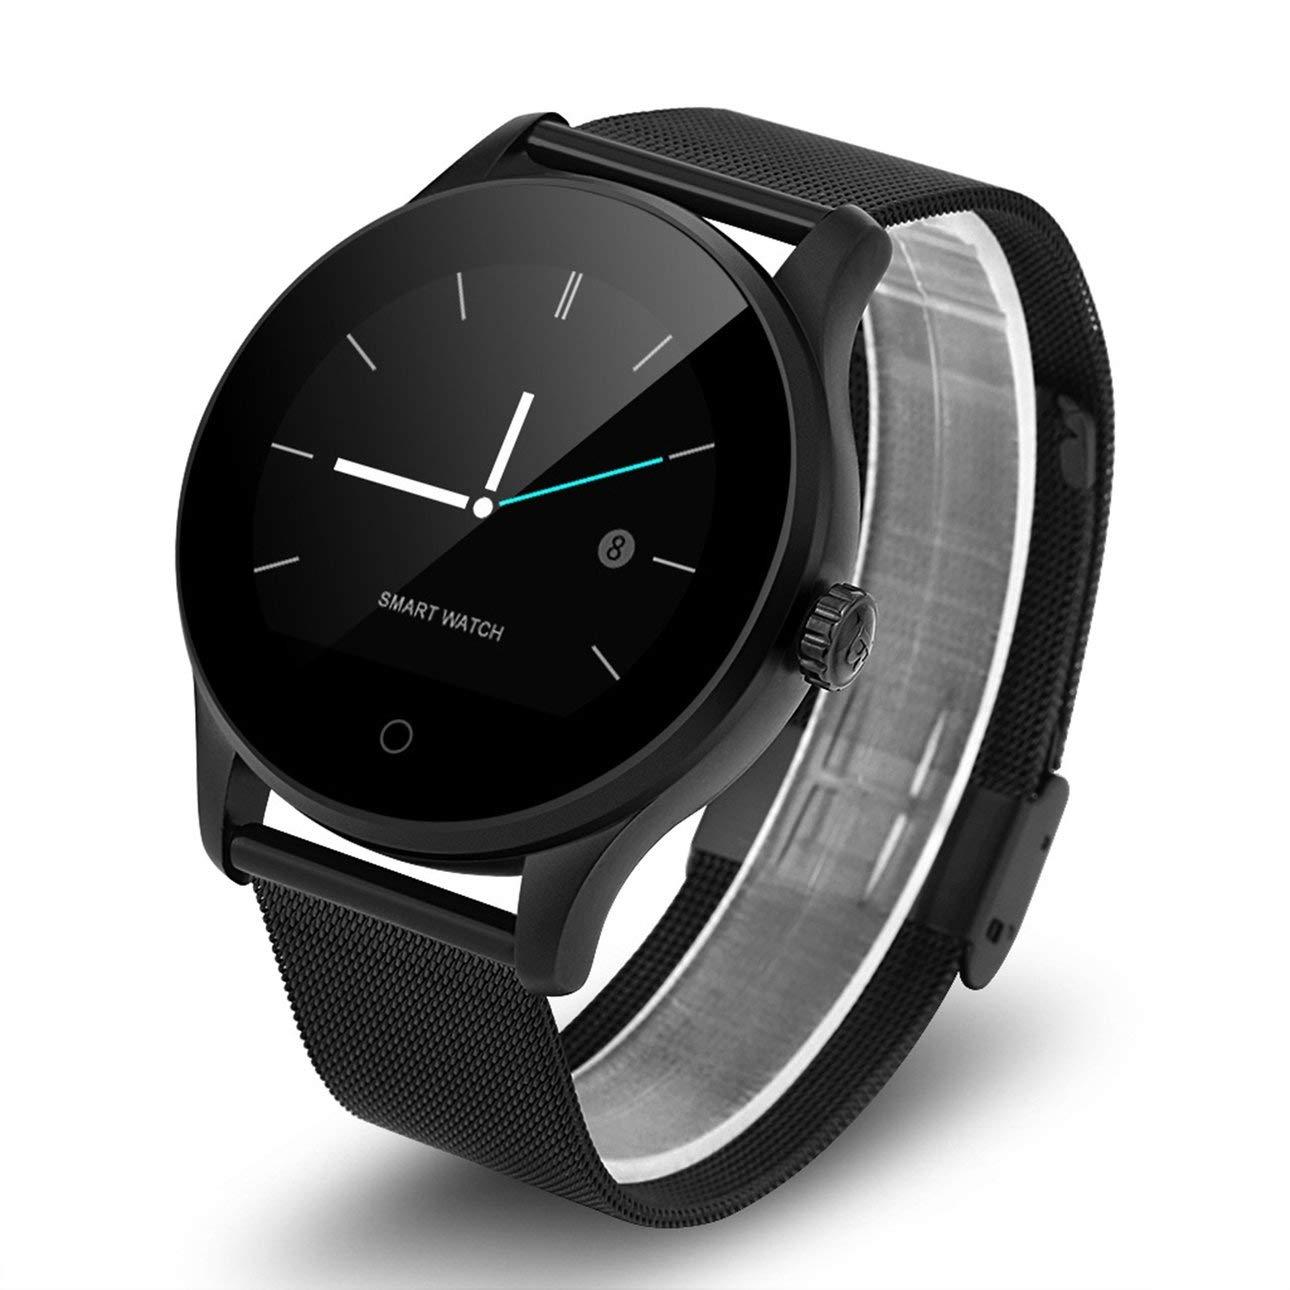 Amazon.com: Liobaba K88H Smart Watch Tracker Bluetooth ...